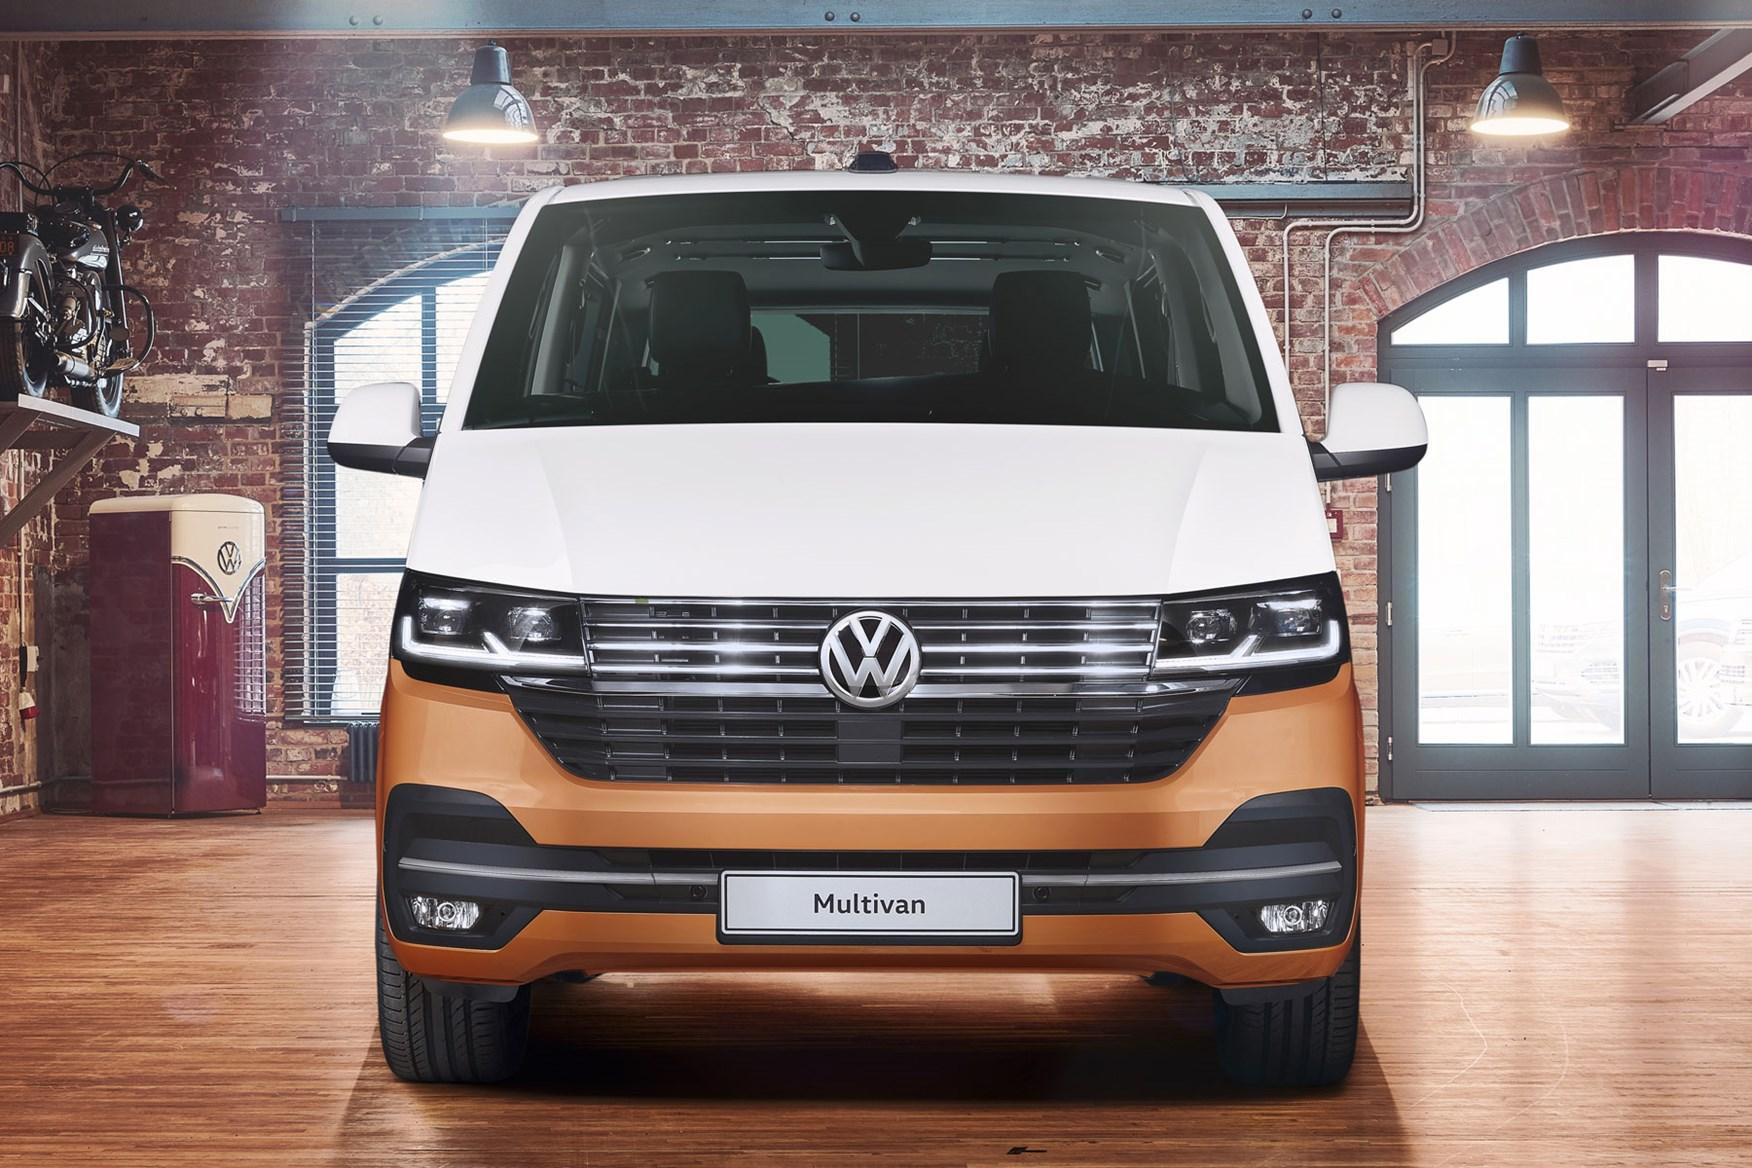 volkswagen transporter t6 1 officially revealed full. Black Bedroom Furniture Sets. Home Design Ideas